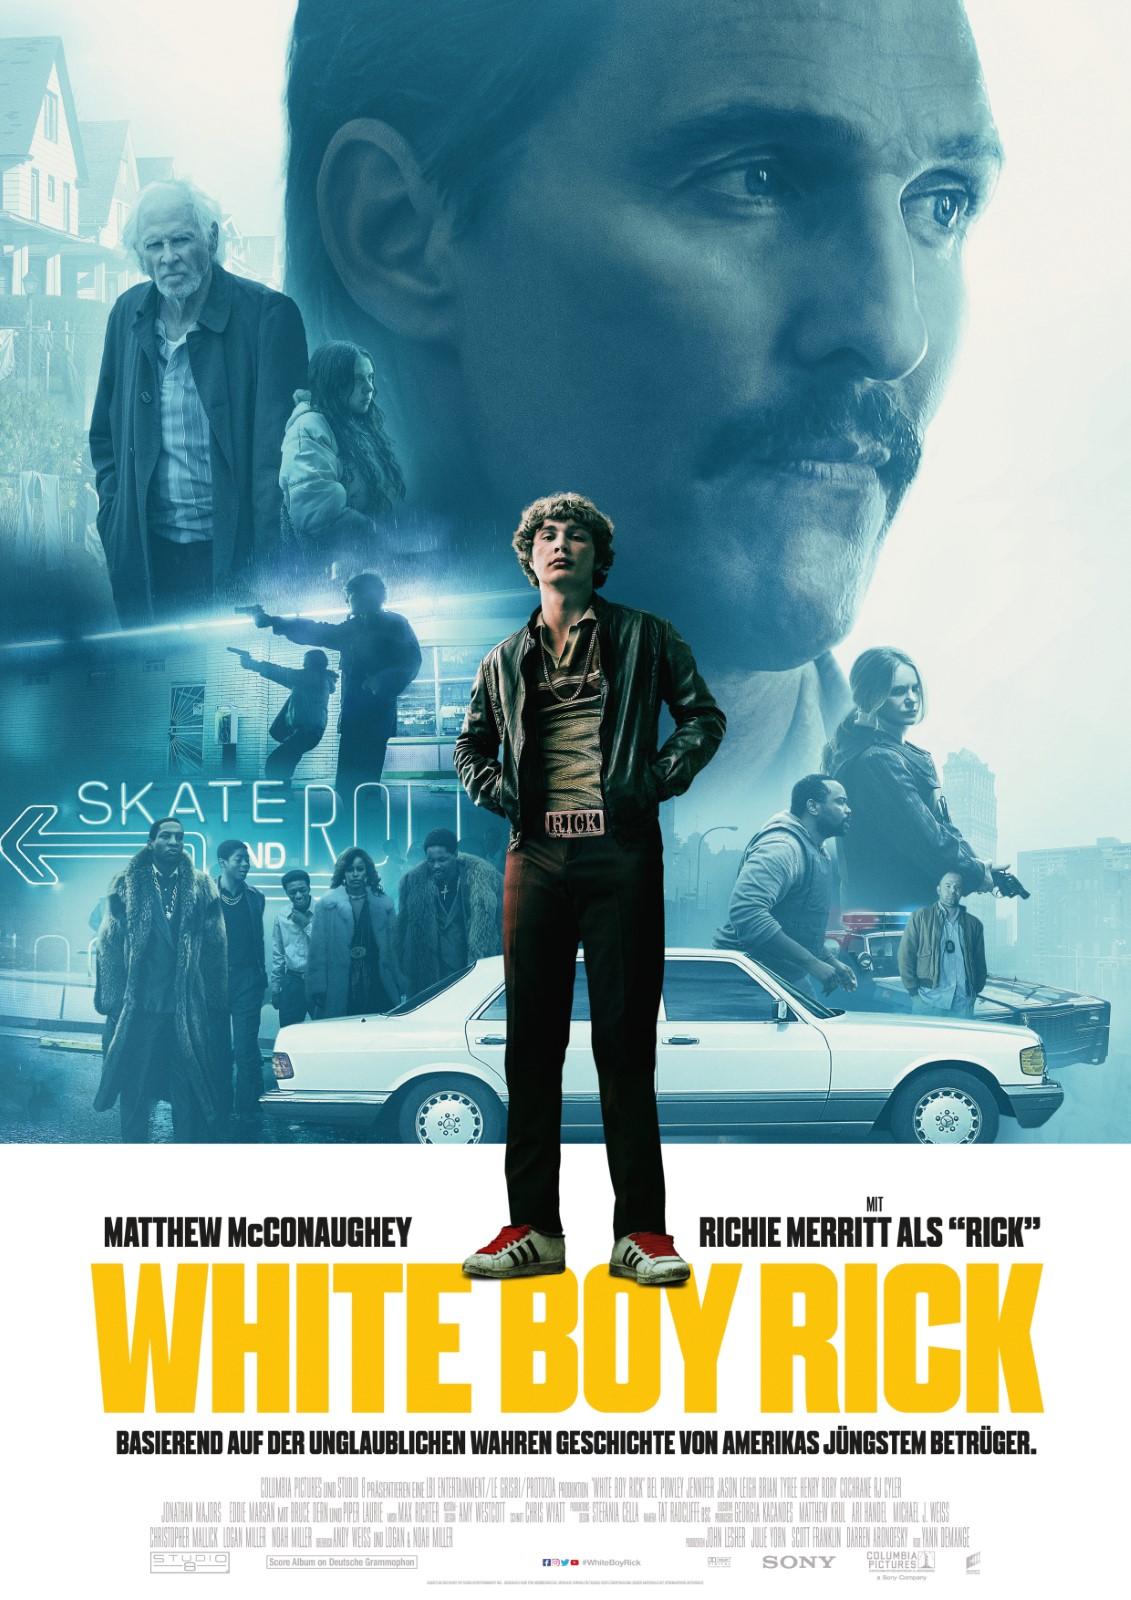 White Boy Rick Film